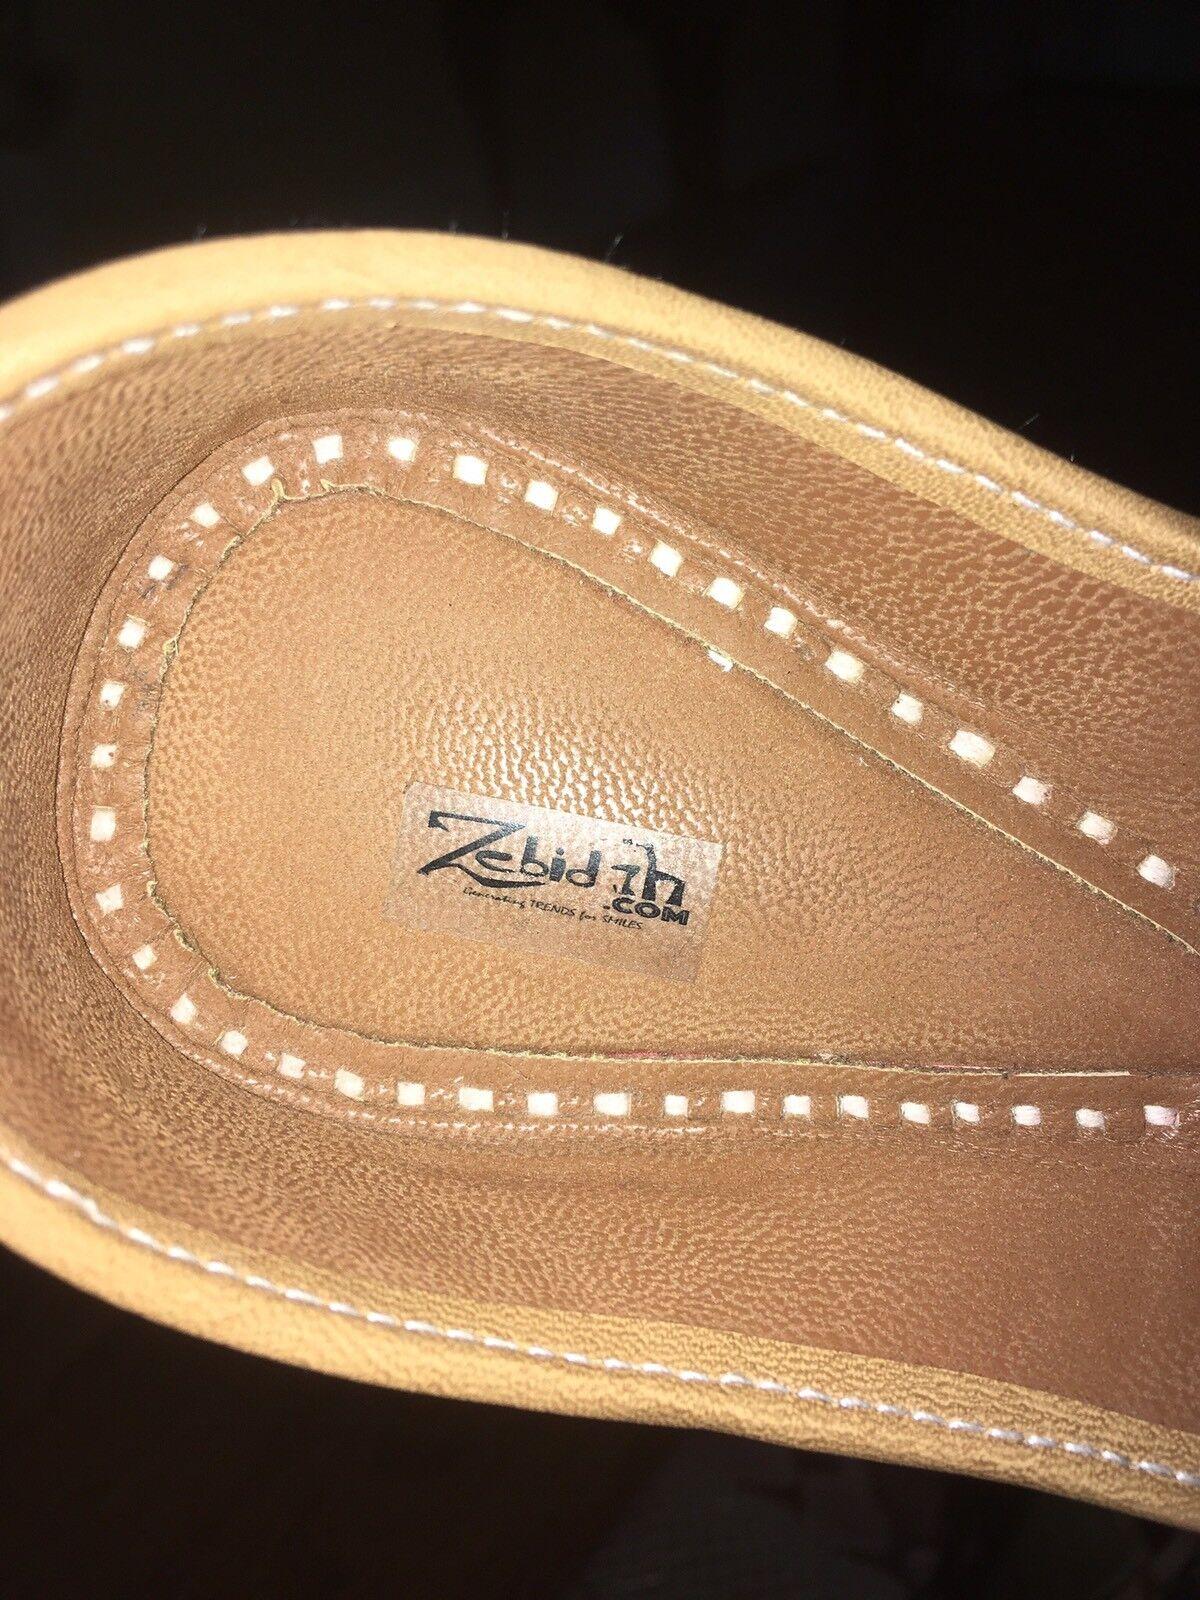 Zebidah Flats, Größe 36 Größe (US Größe 36 5.5) 157b60